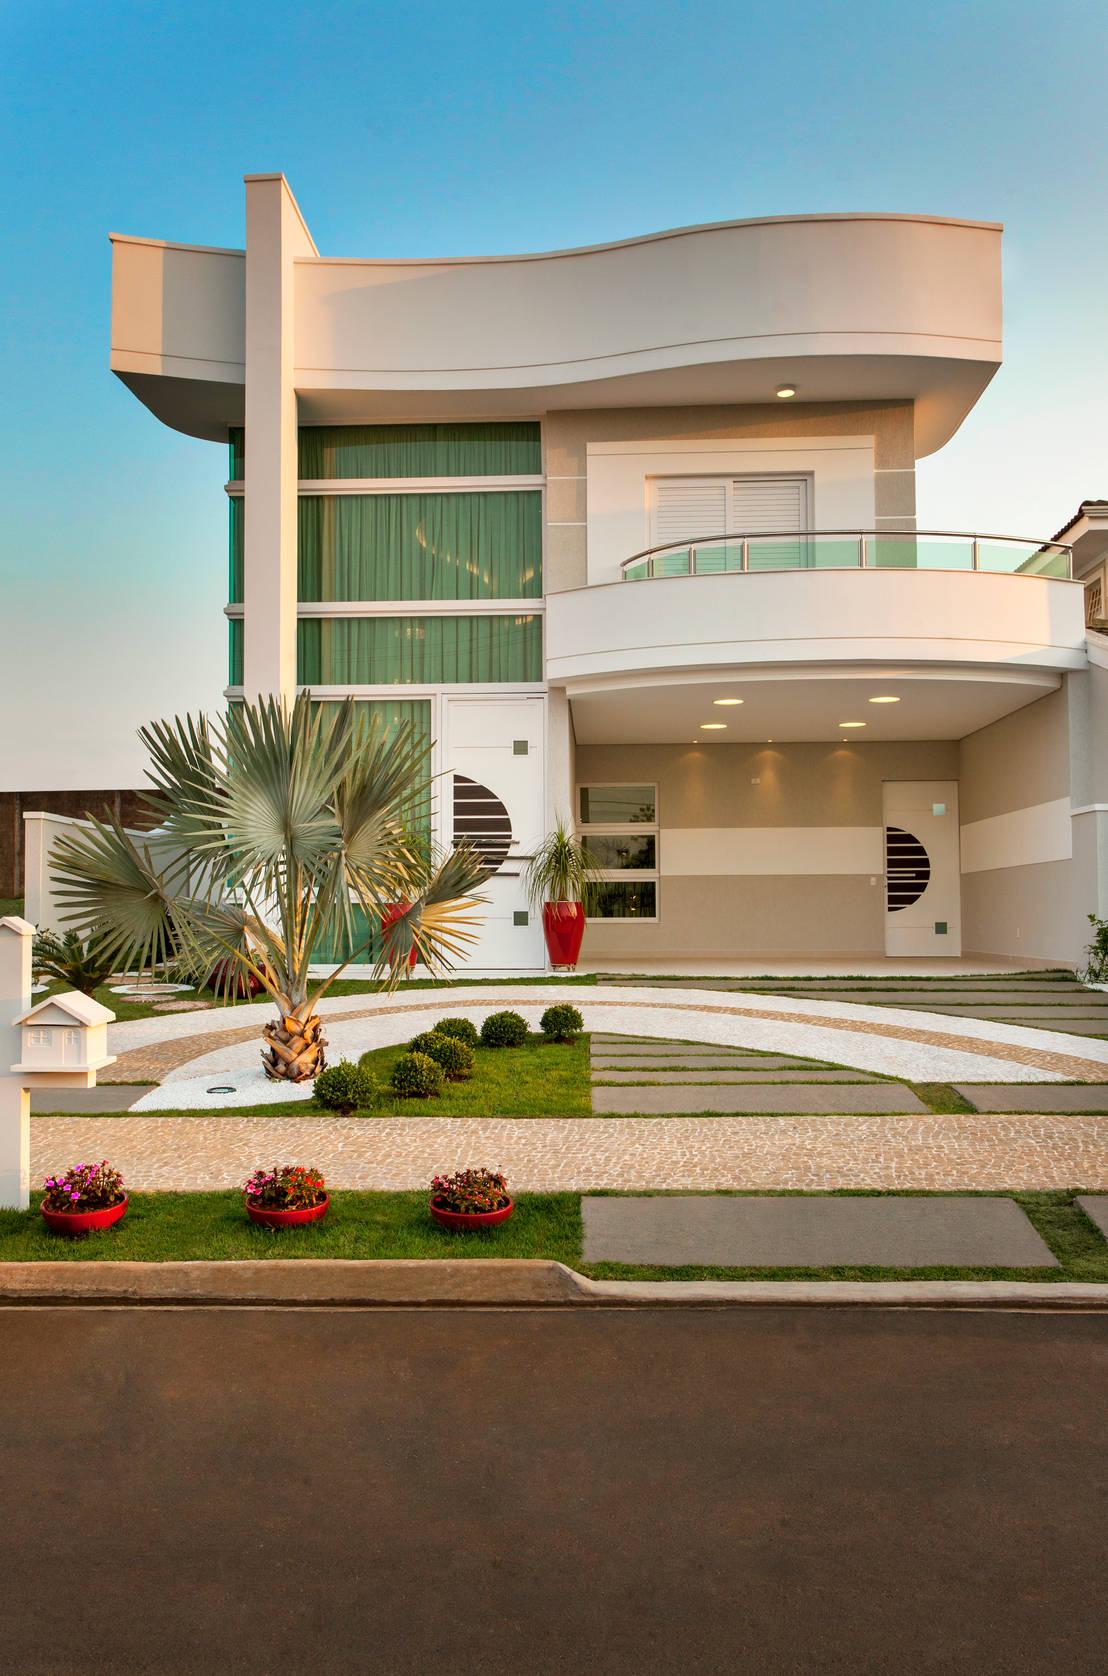 10 ideias para a cal ada na frente de casa for Fachada de casas modernas lujosas